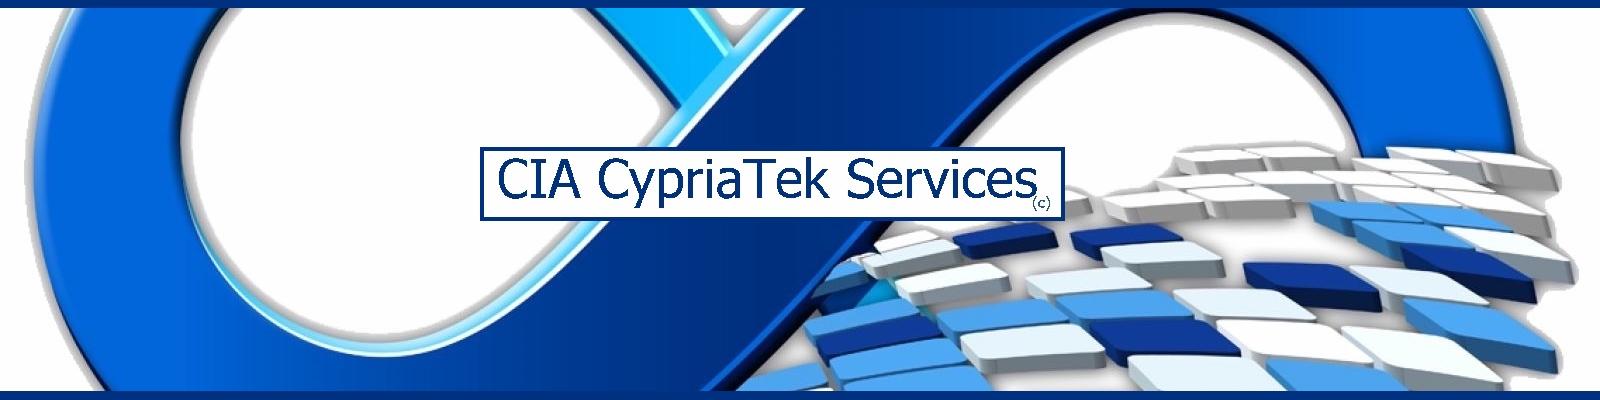 CIA CypriaTek Services